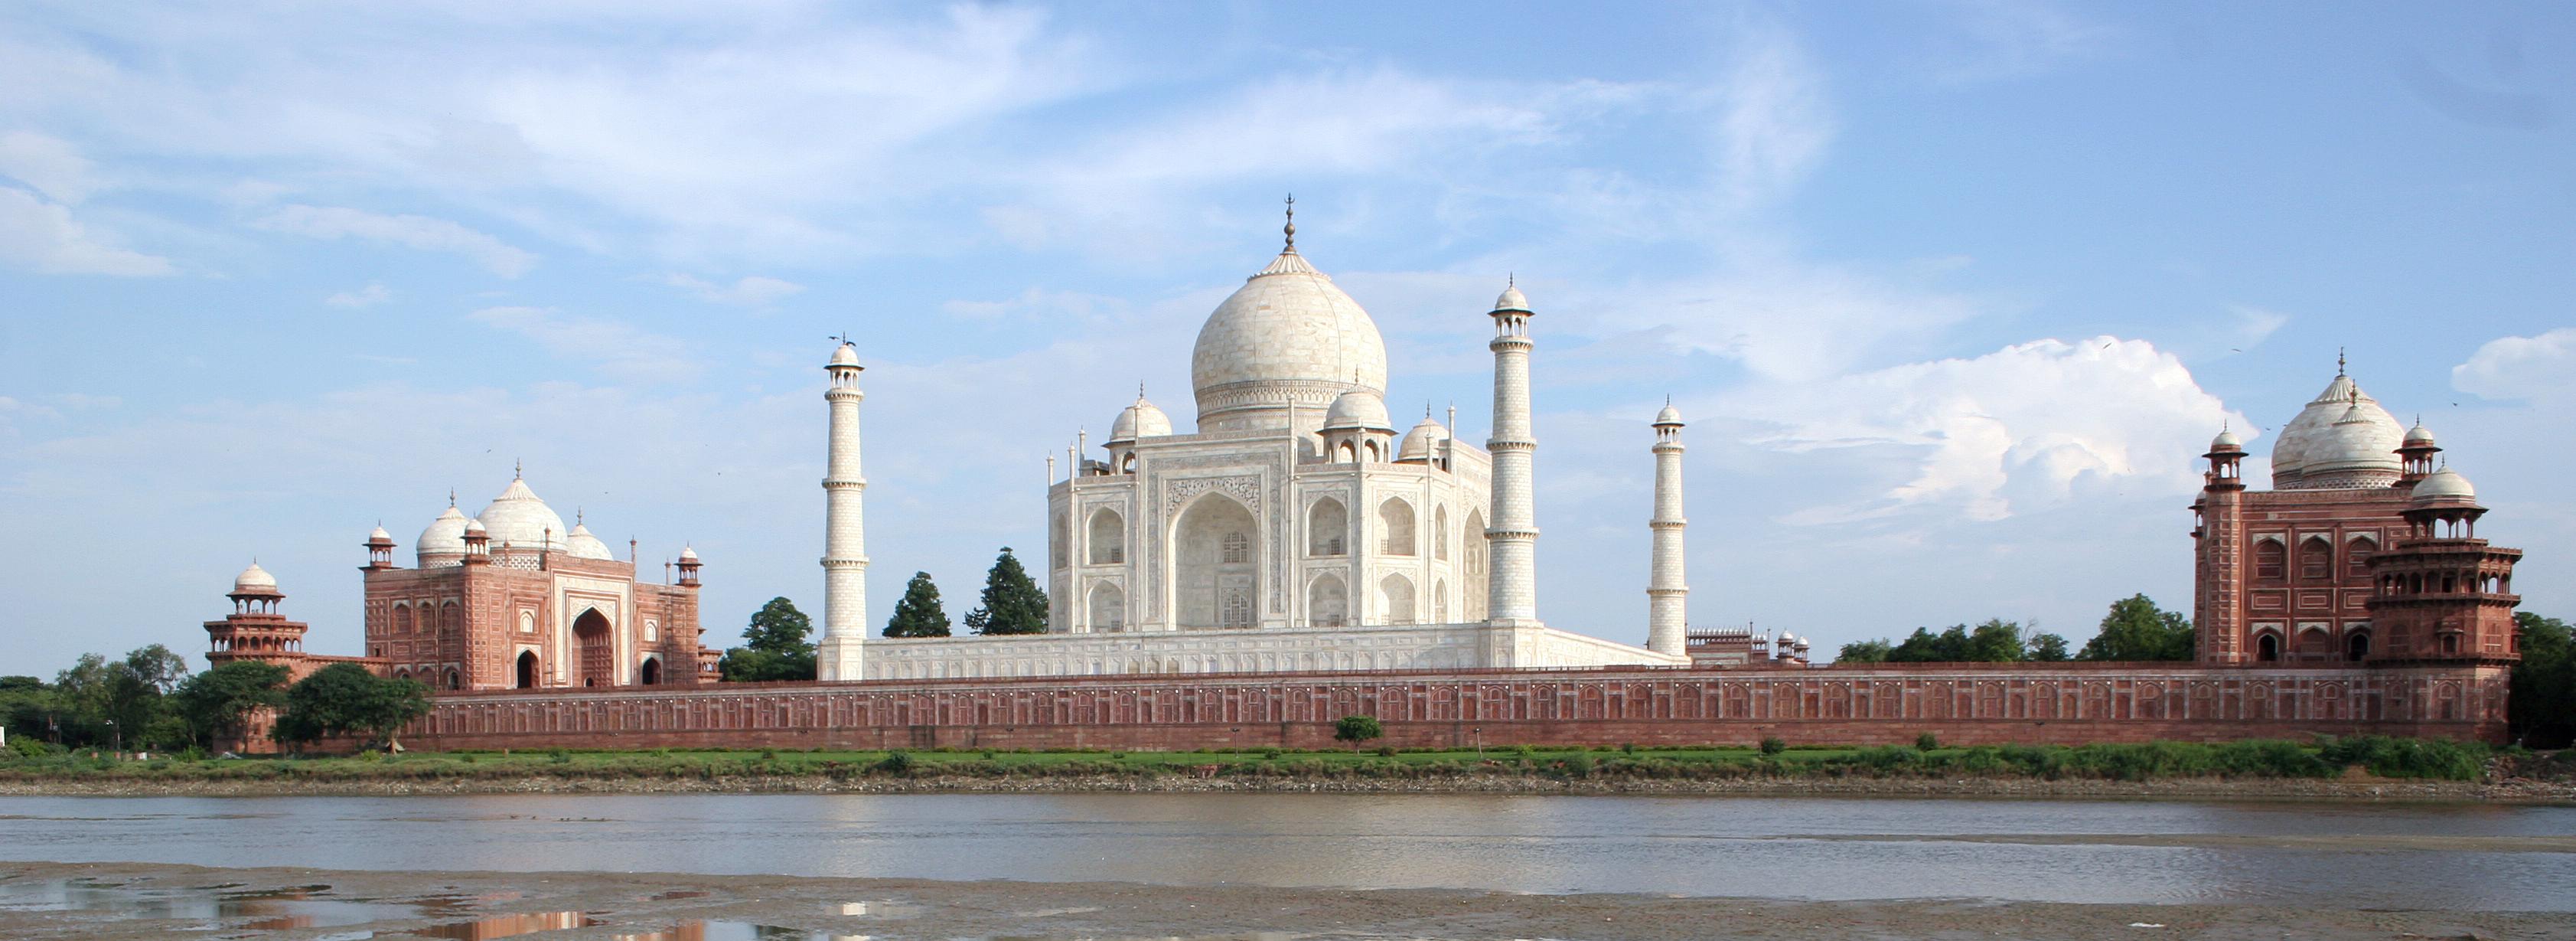 Taj Mahal from across the Yamuna River